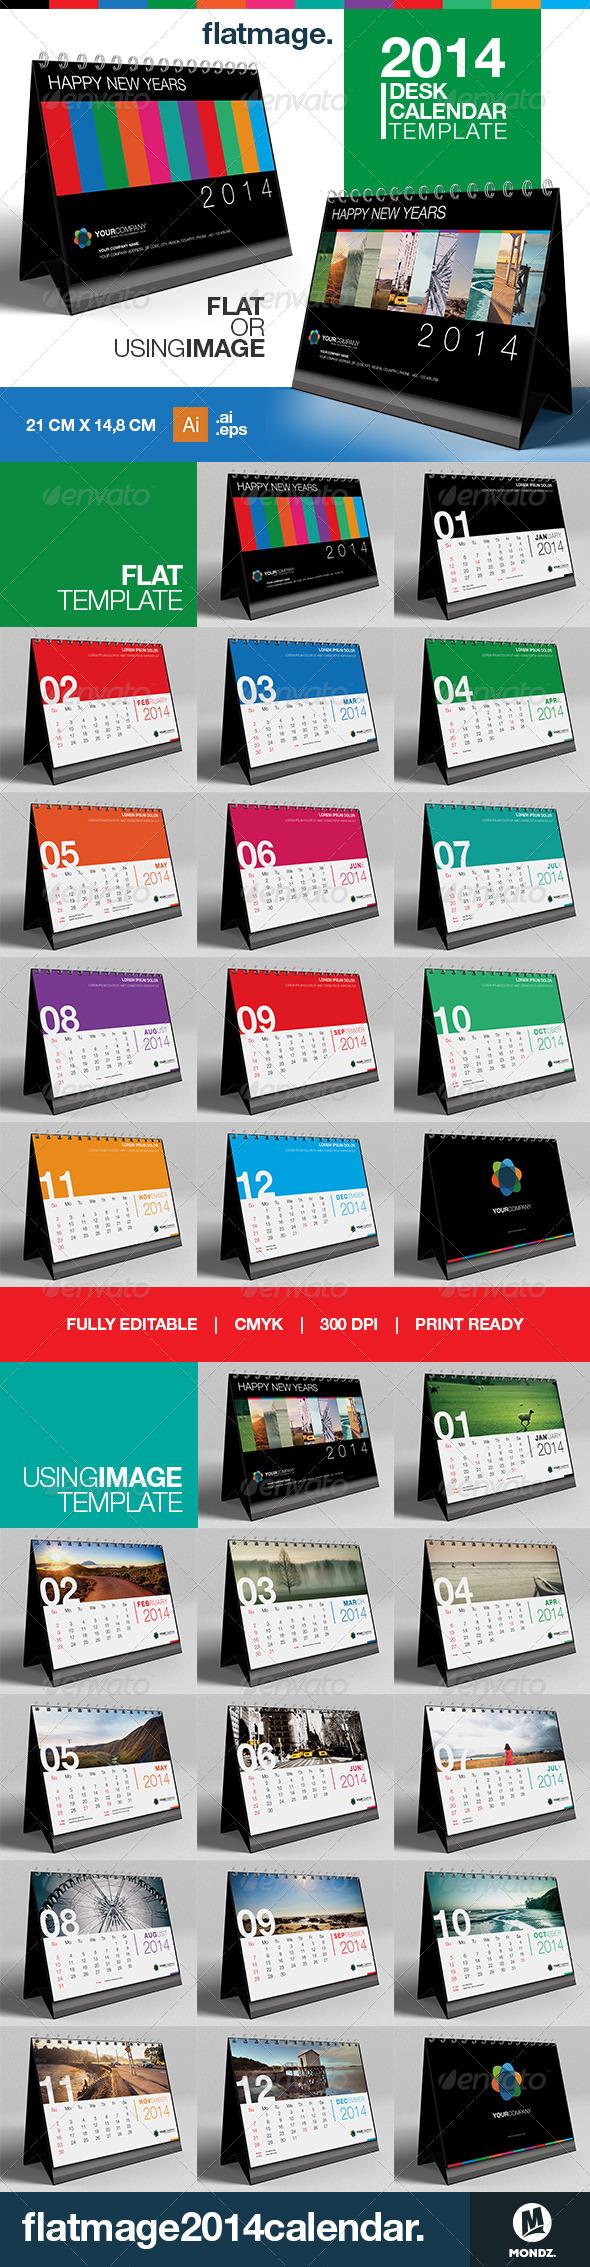 GraphicRiver Flatmage Desk Calendar 2014 Template 6449148